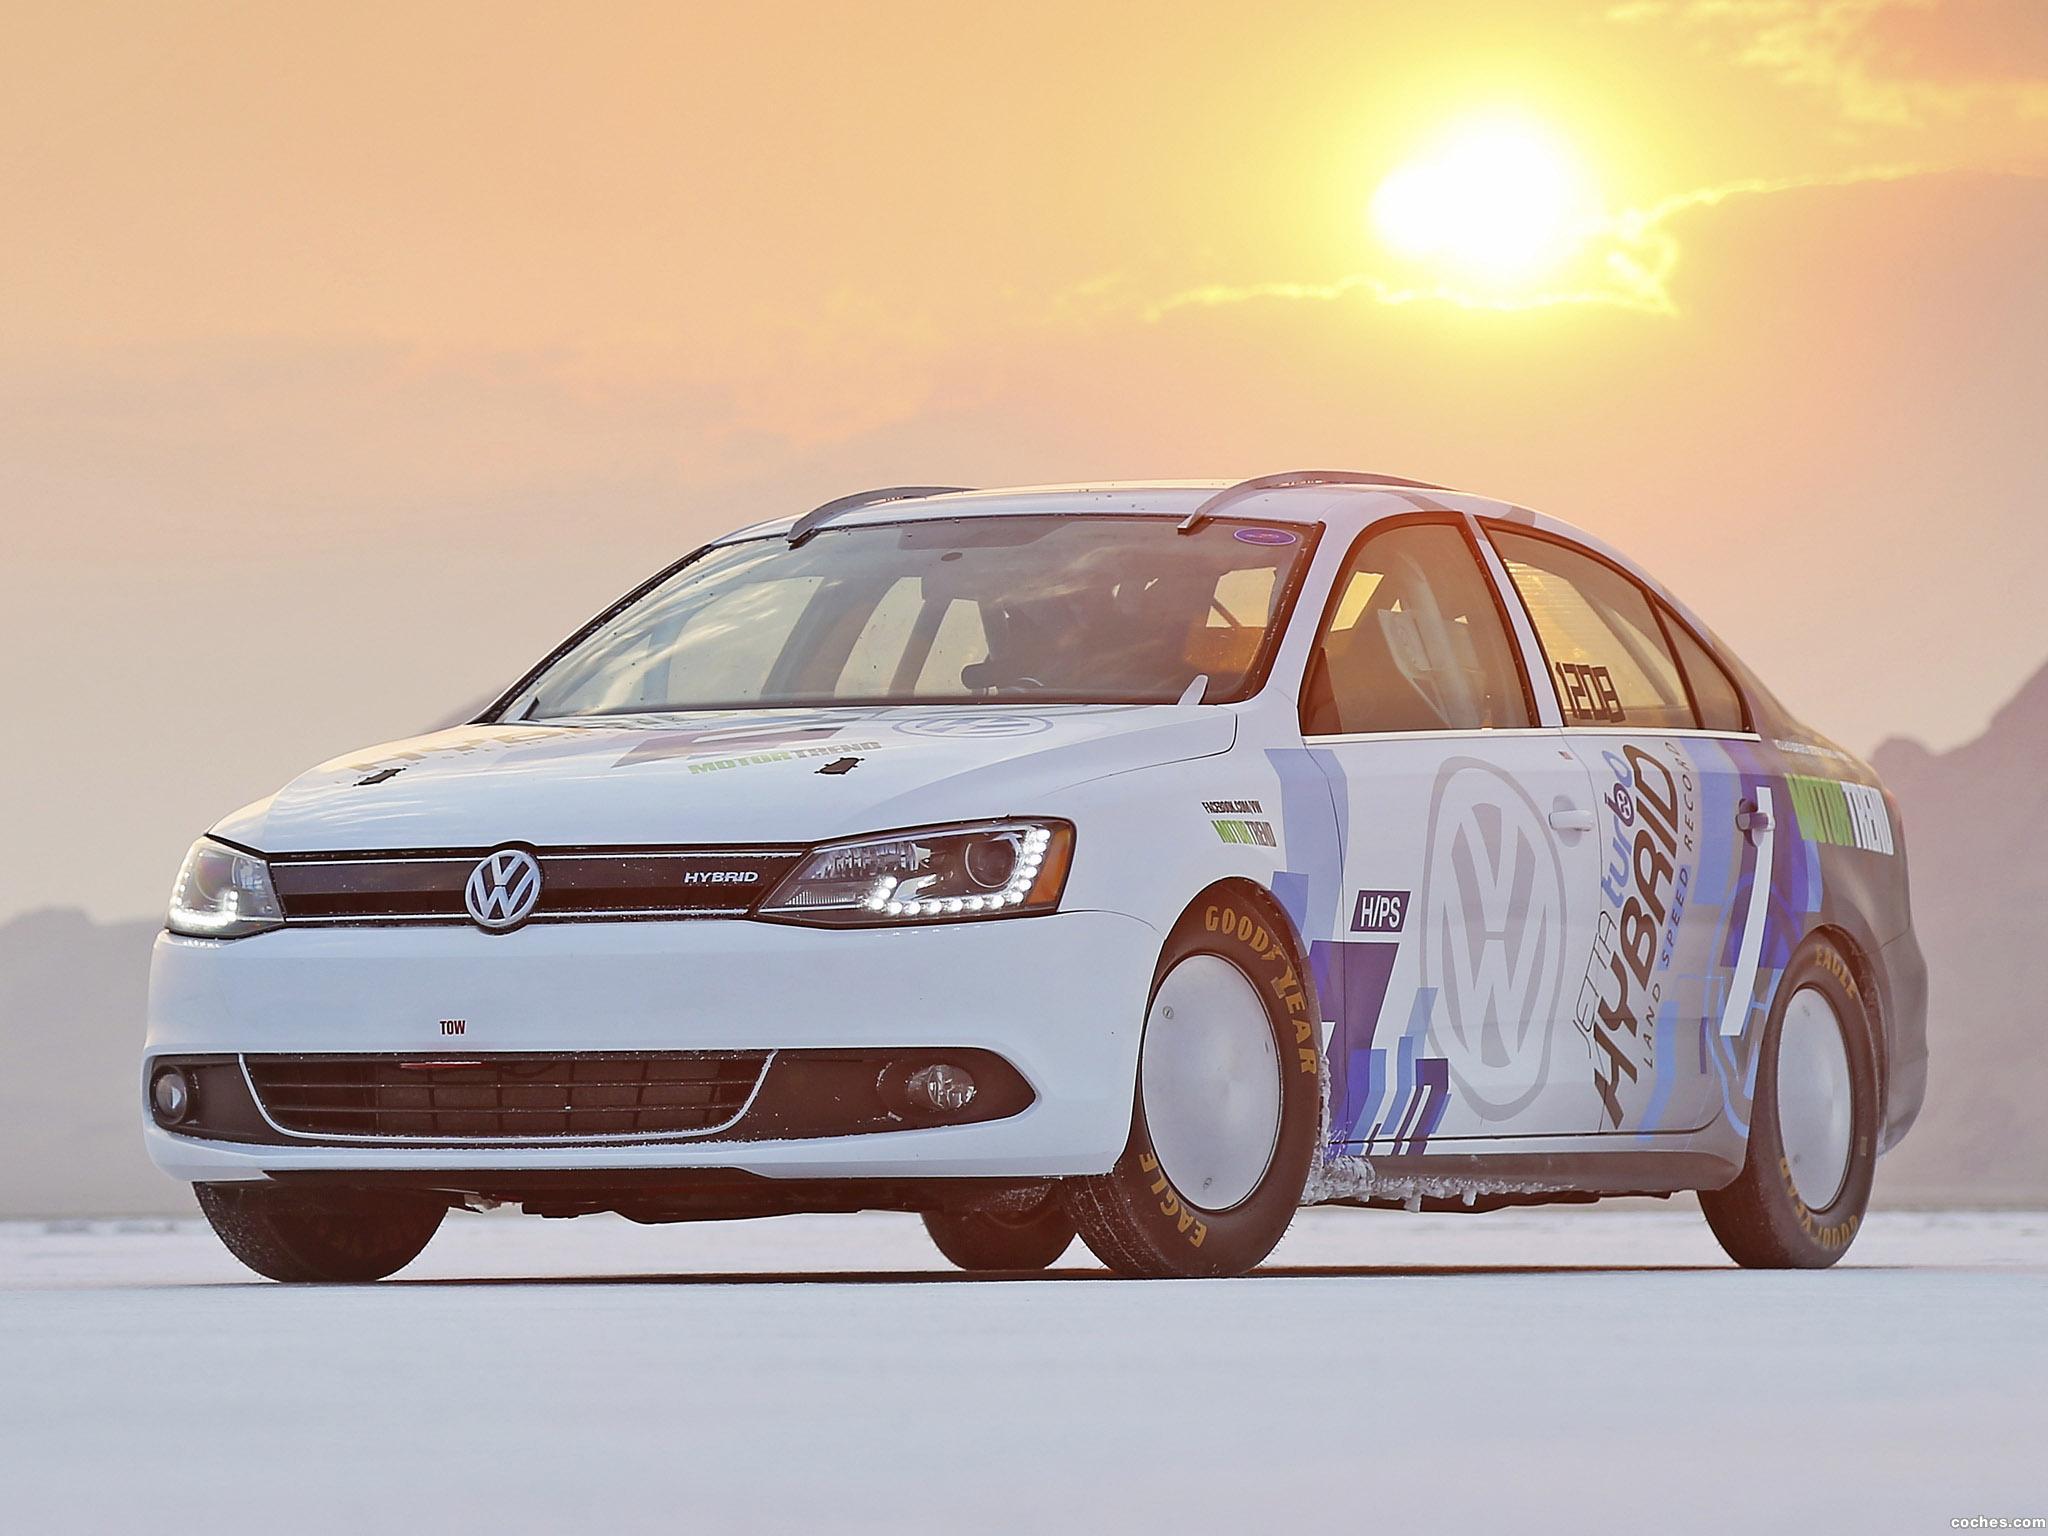 Foto 0 de Volkswagen Jetta Hybrid Bonneville Speed Record Car 2012